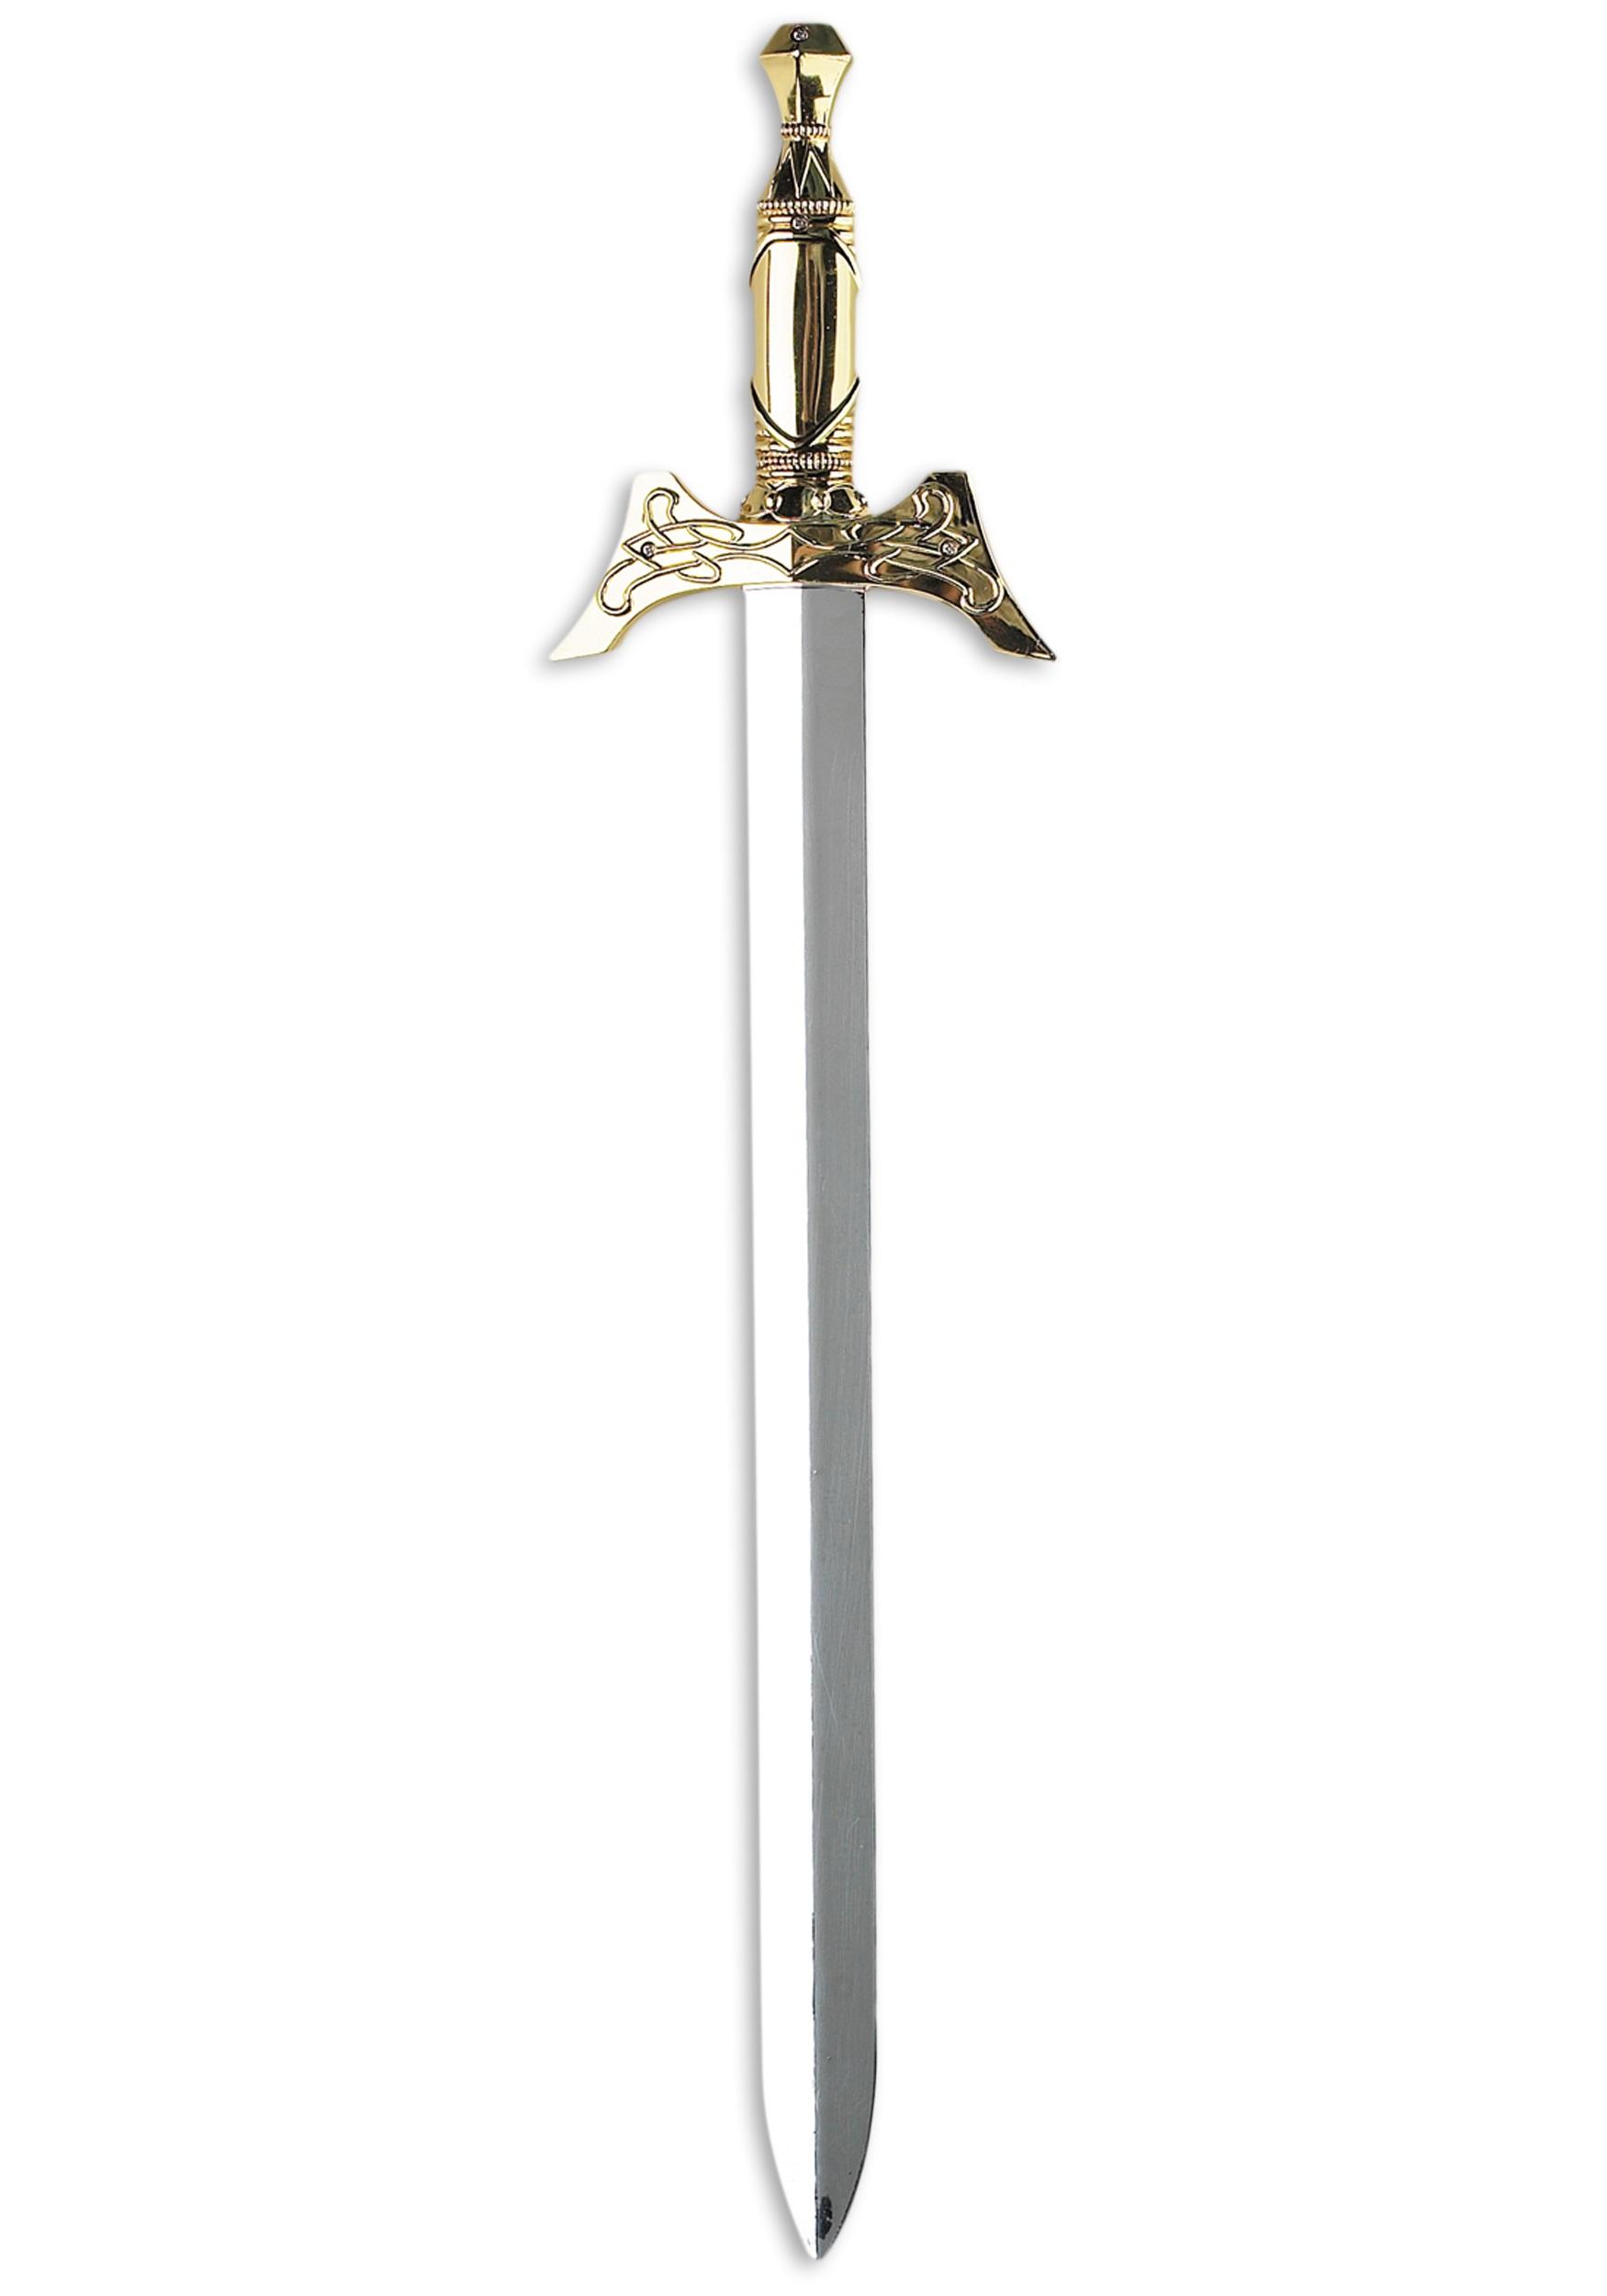 Knight's Sword Prop Accessory